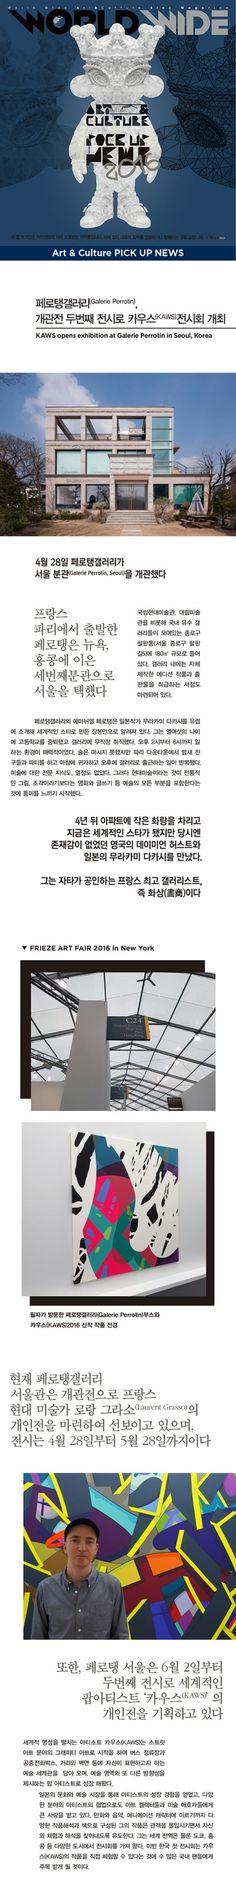 Blog Magazine ● WORLD WIDE: Art & Culture PICK UP NEWS∥페로탱갤러리(Galerie Perrotin), 개관전 두번째 전시로 카우스(KAWS)전시회 개최